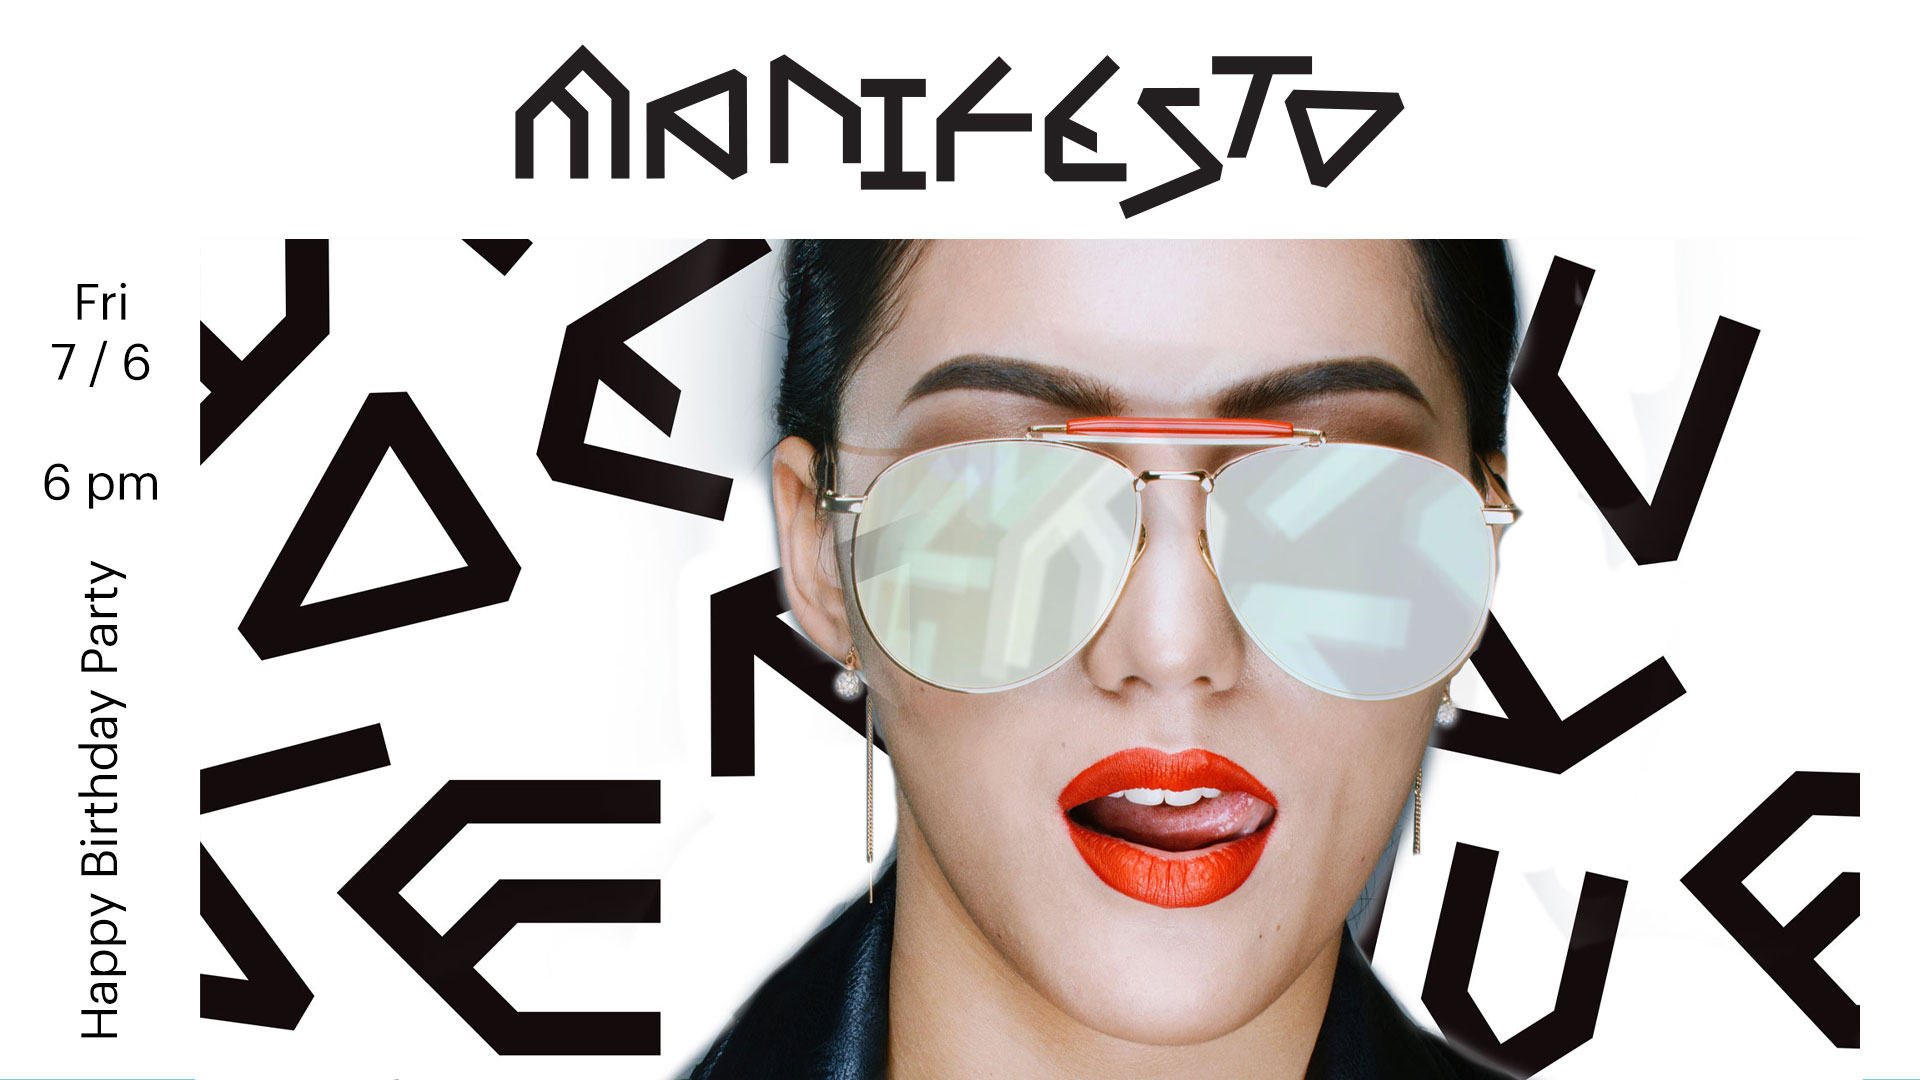 manifesto-annivEvent-01-X.jpg